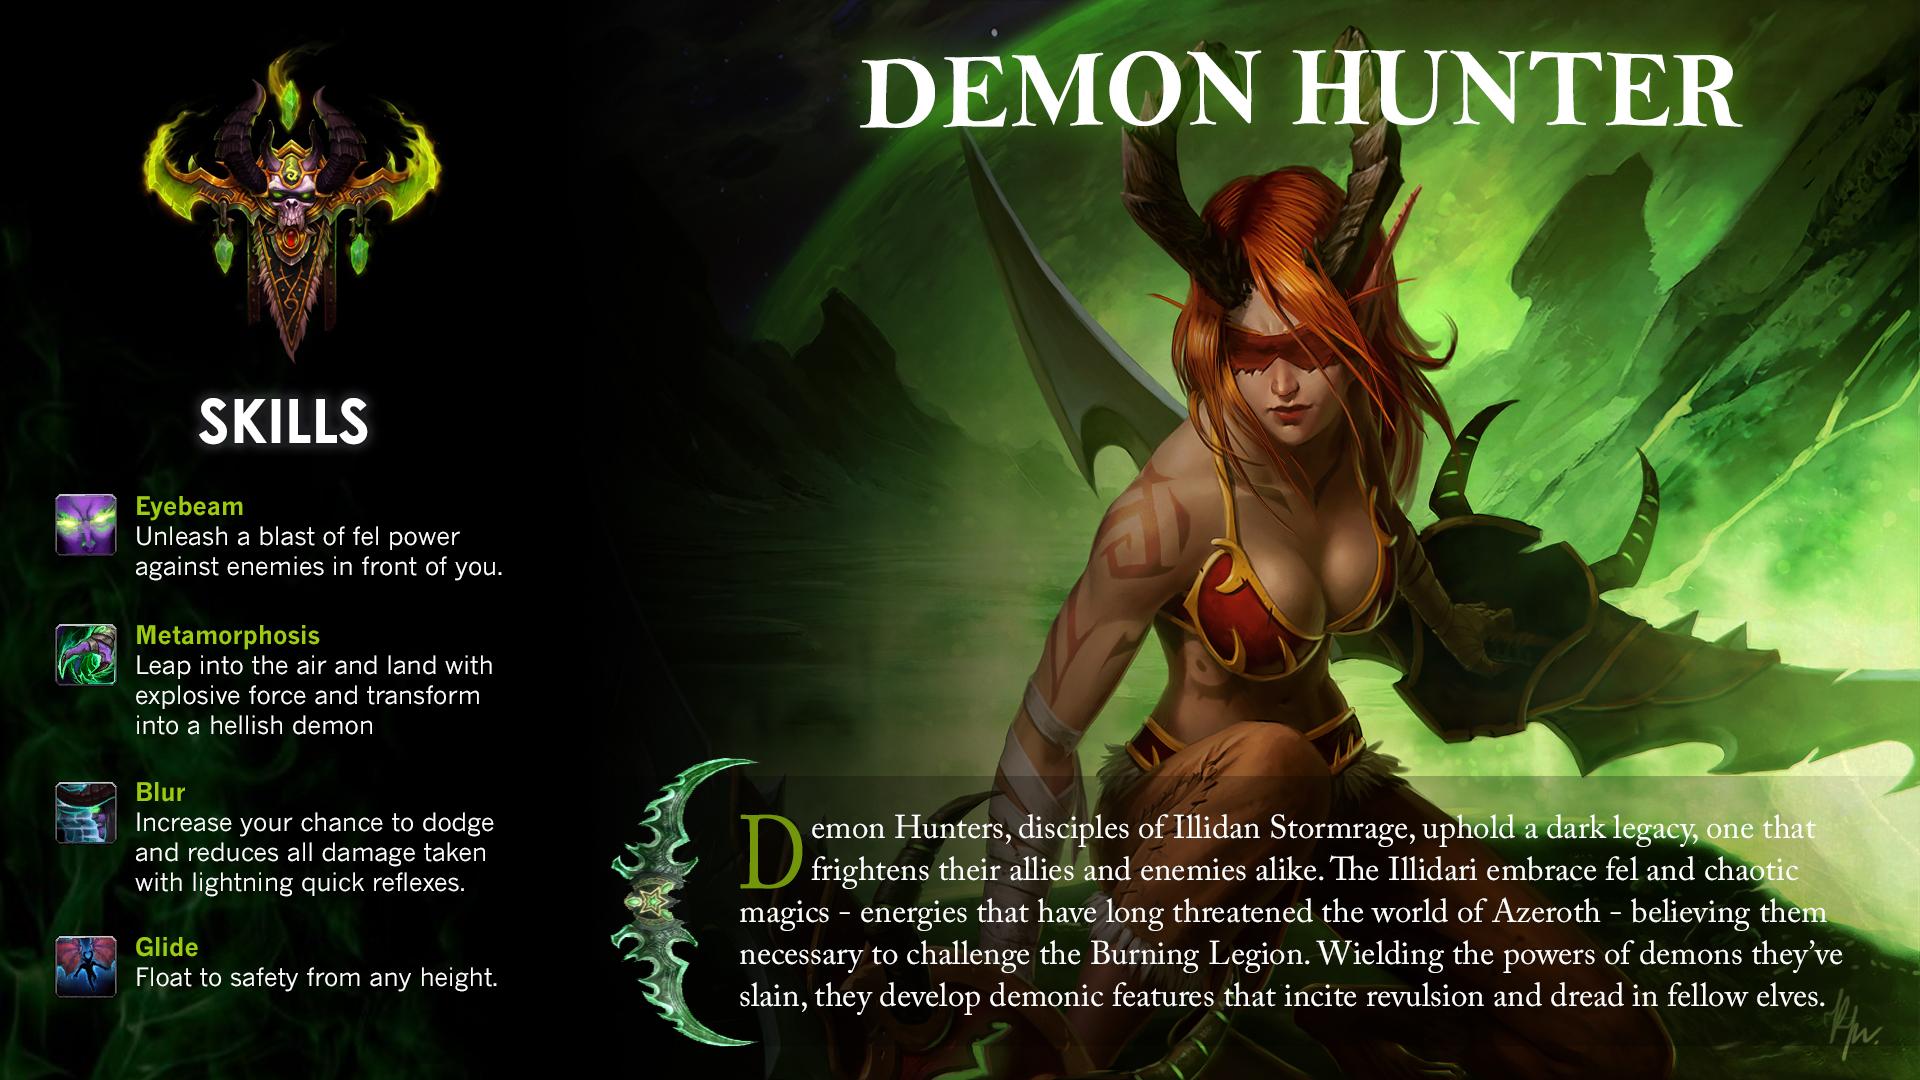 Battle For Azeroth Demon Hunter 1920x1080 Wallpaper Teahub Io